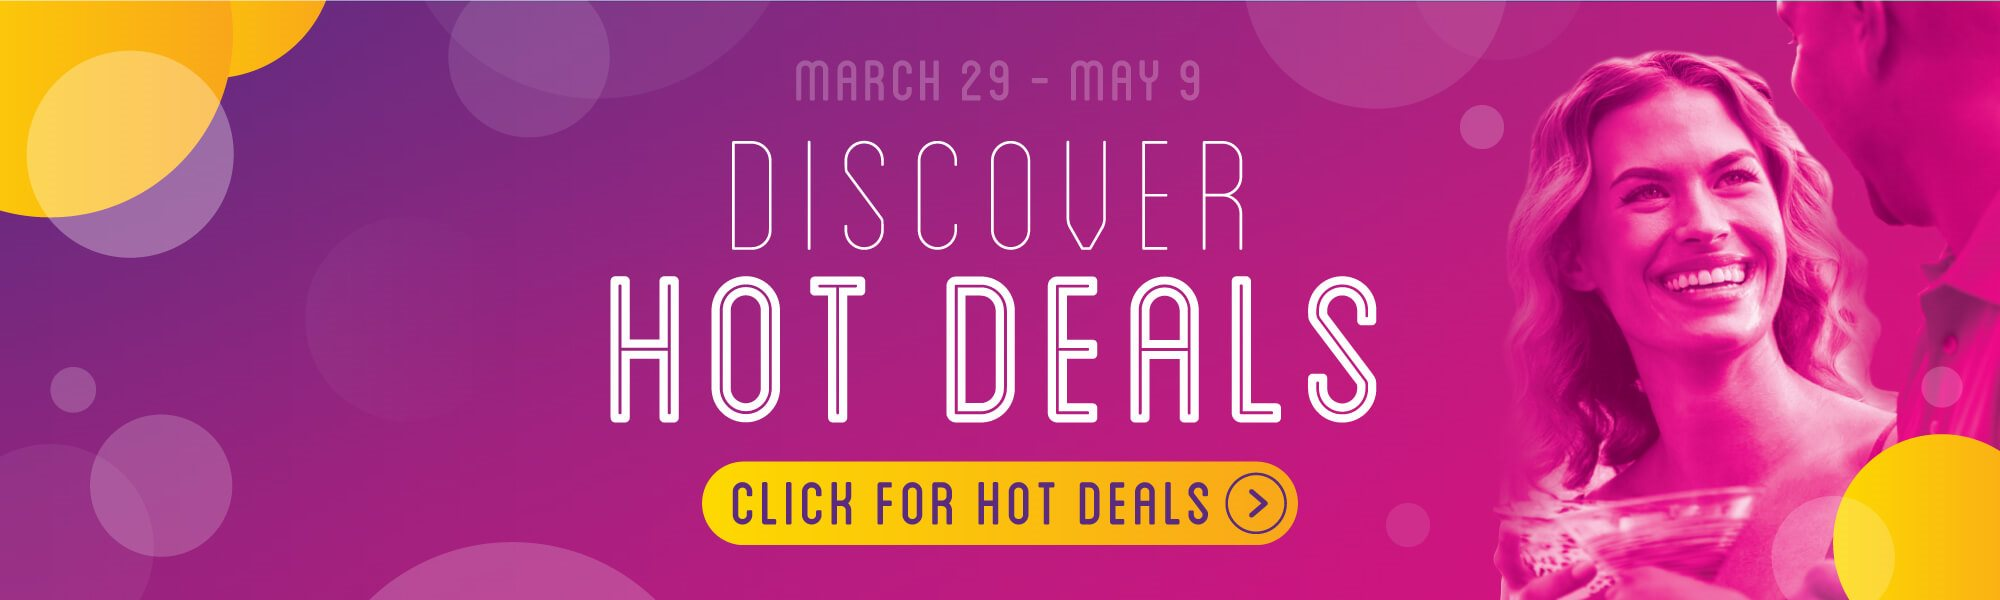 Hot-Deals-p1-SLIDER-EN